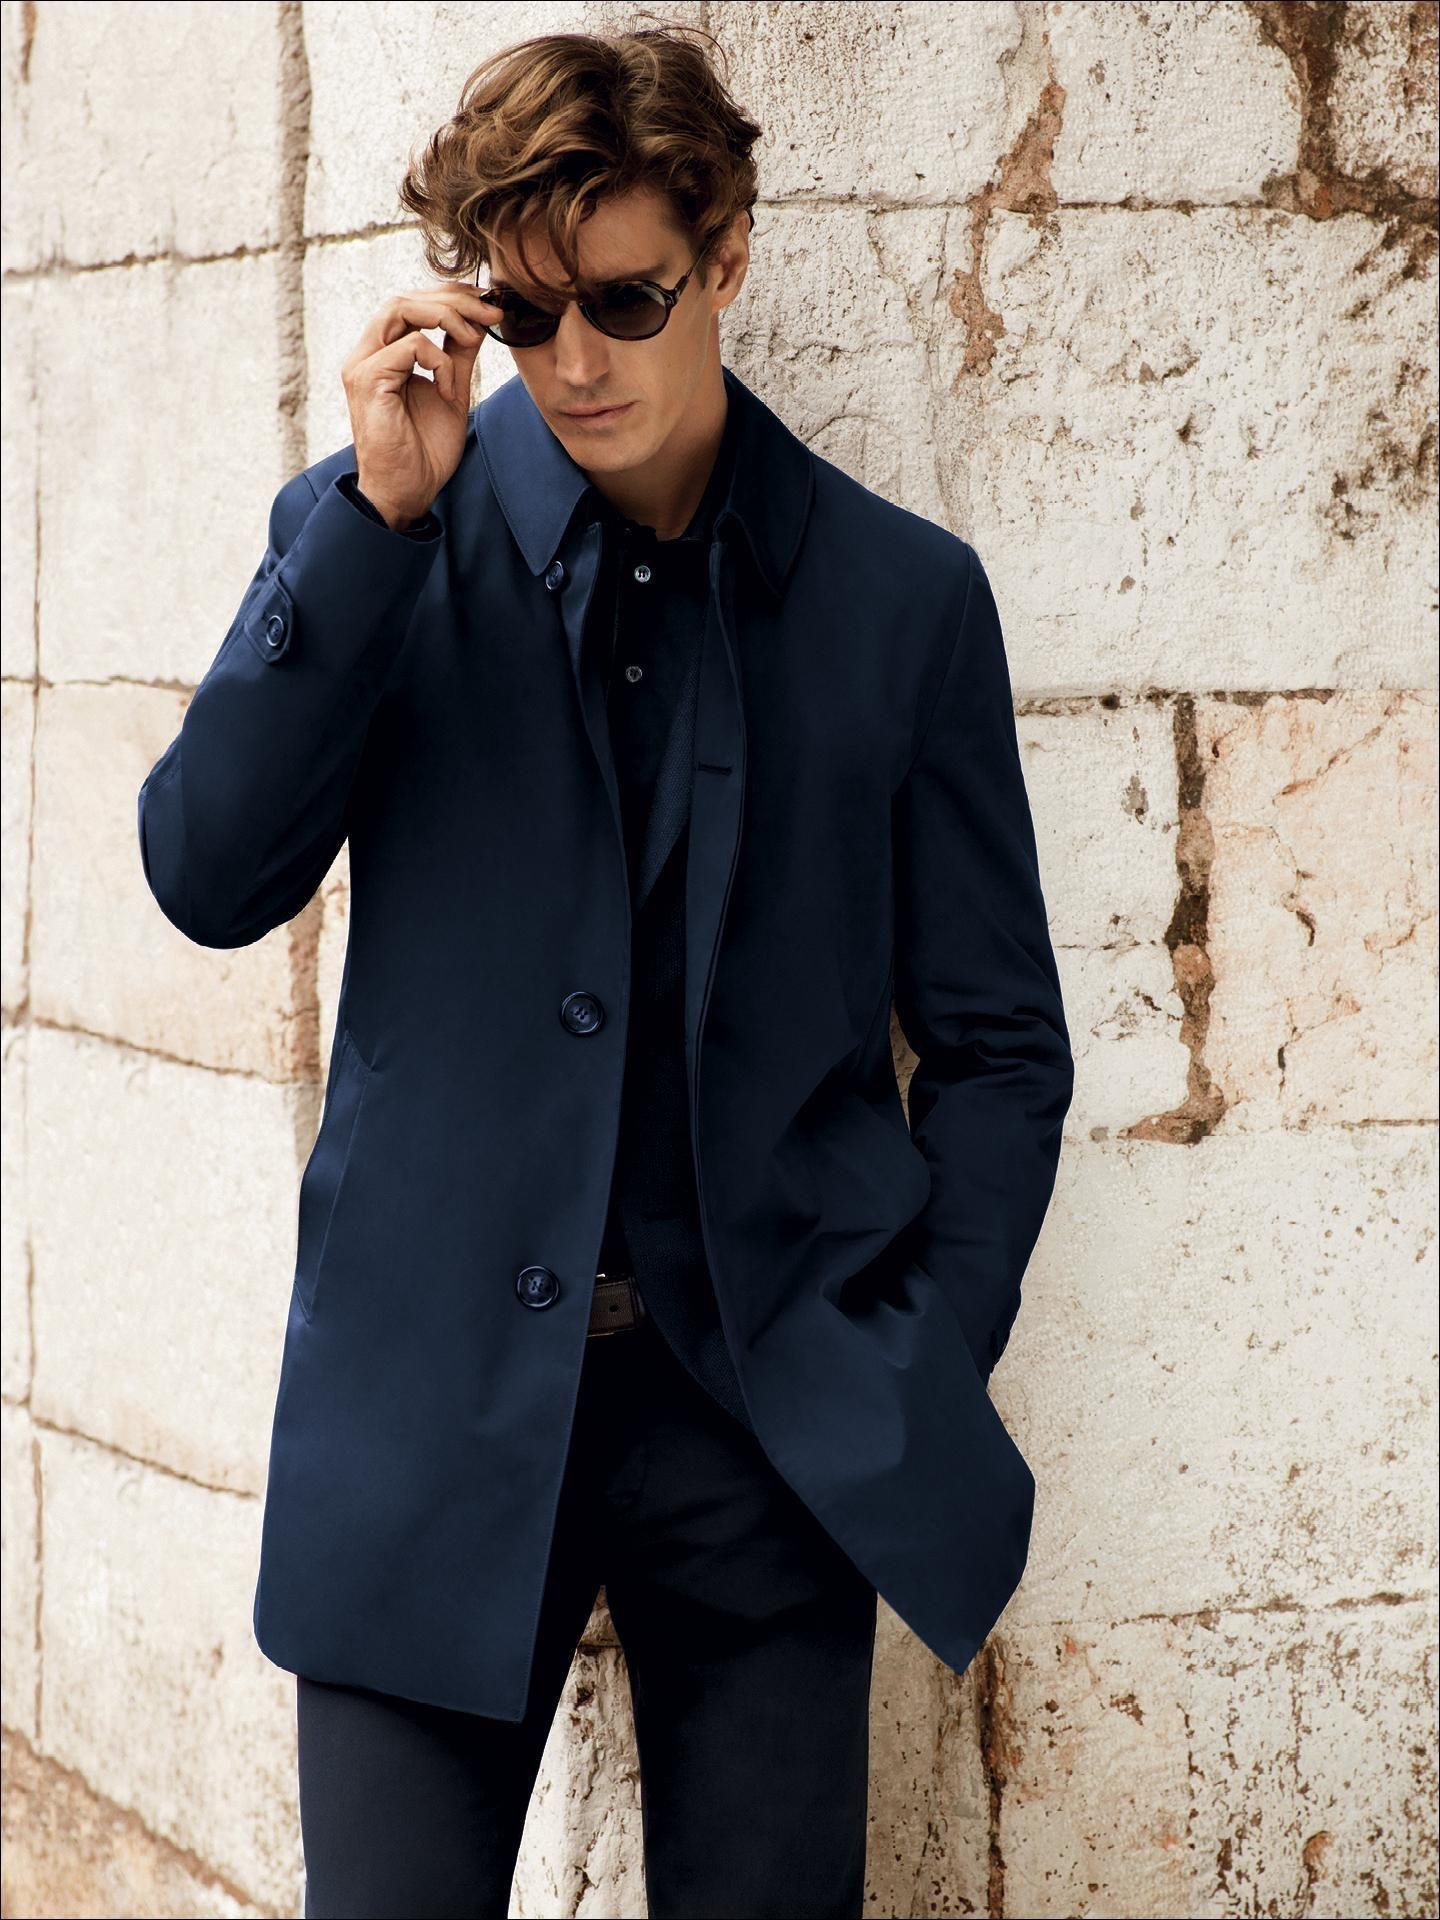 Gucci Polo Shirt Dhgate | RLDM